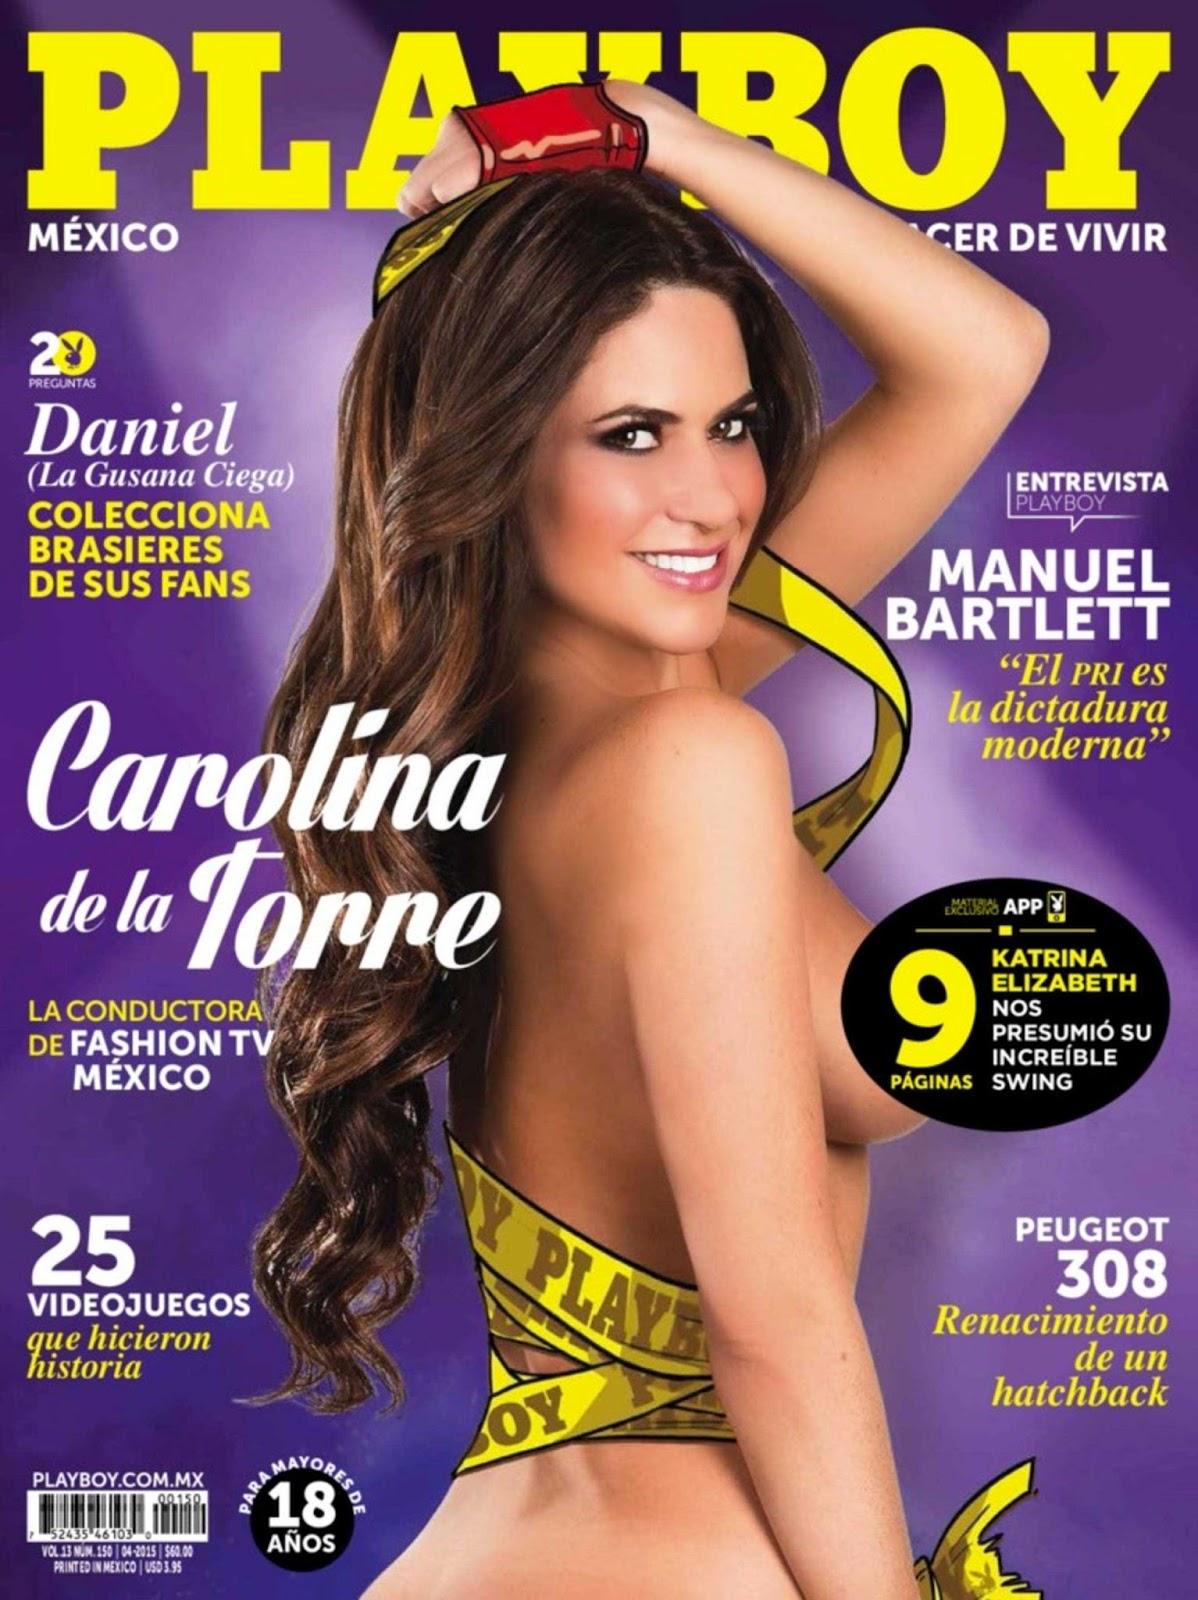 Carolina de la Torre On The Cover Of Playboy Magazine